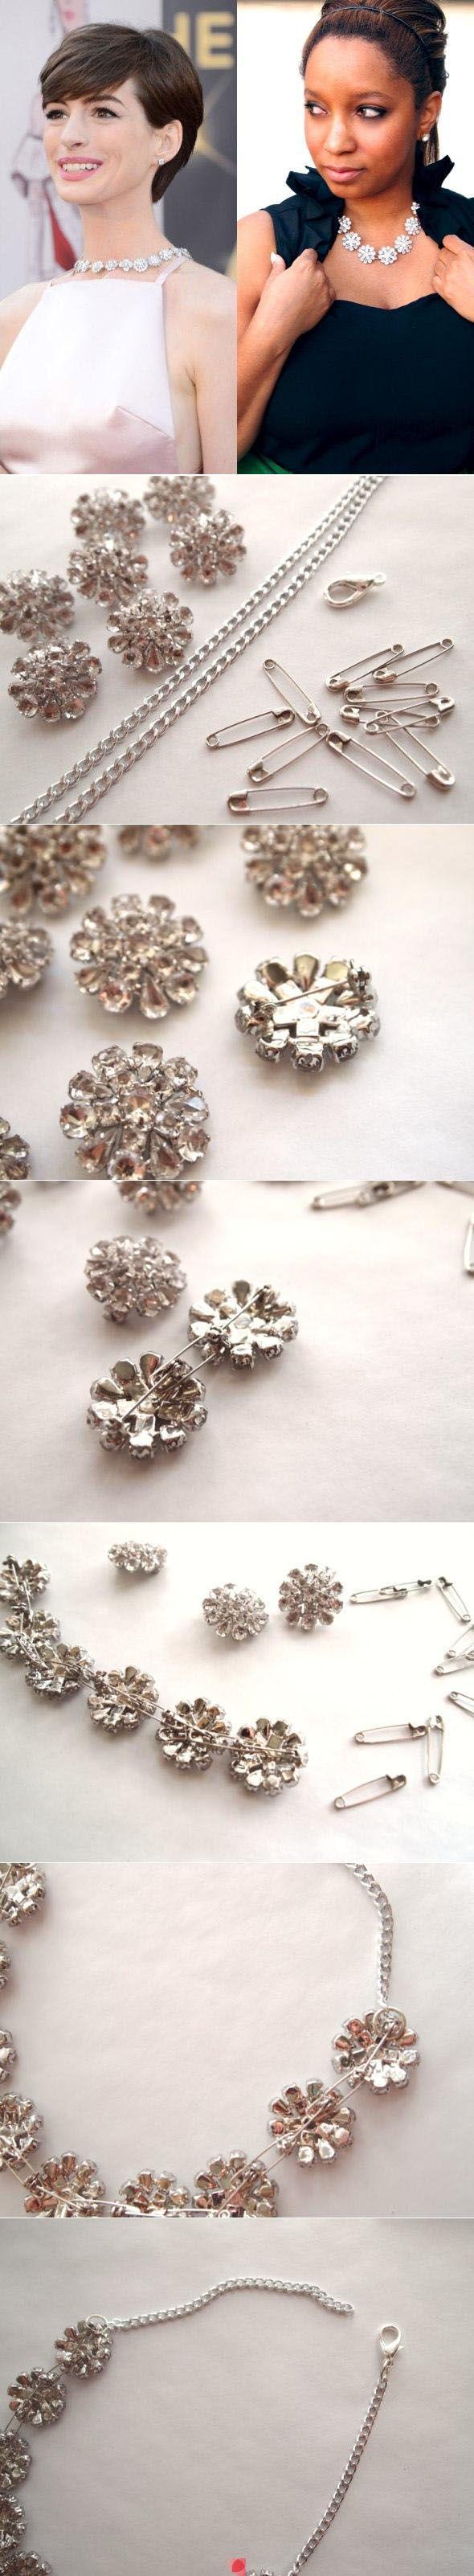 collier broches pingles nourrice diy bijoux. Black Bedroom Furniture Sets. Home Design Ideas